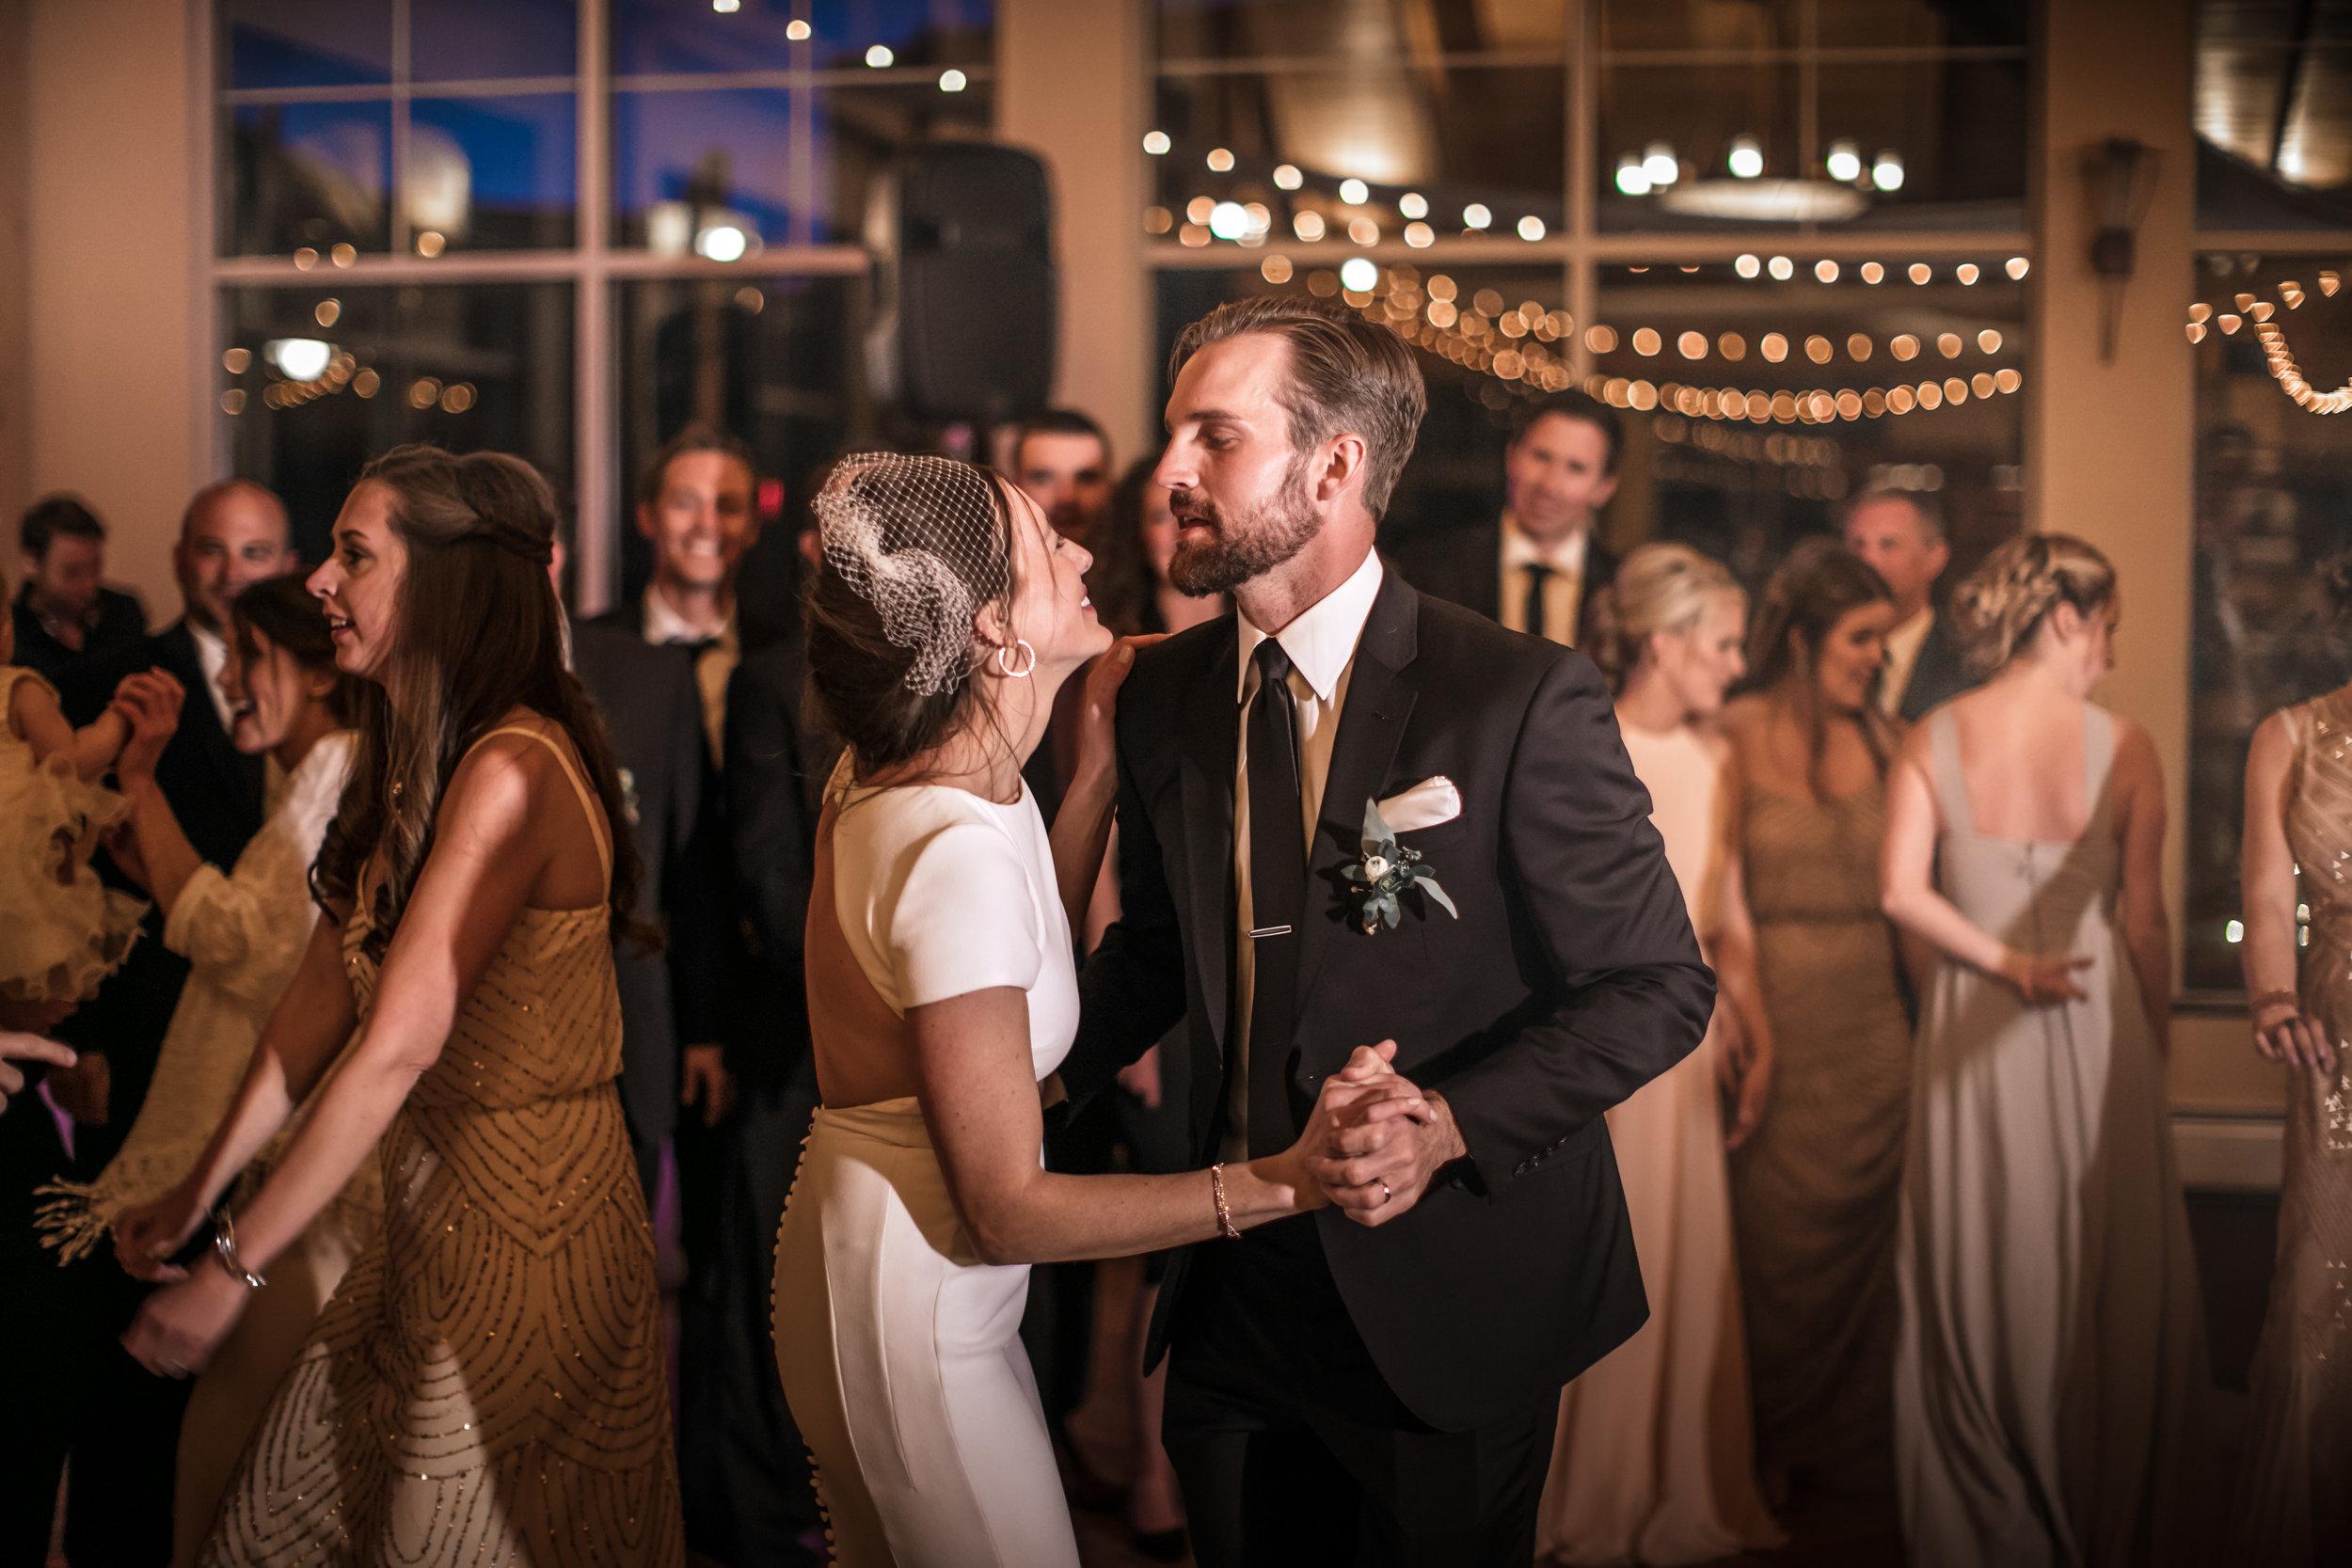 vild-photography-photographer-colorado-intimate-wedding-adventure-Stephanie- Adam-605.jpg